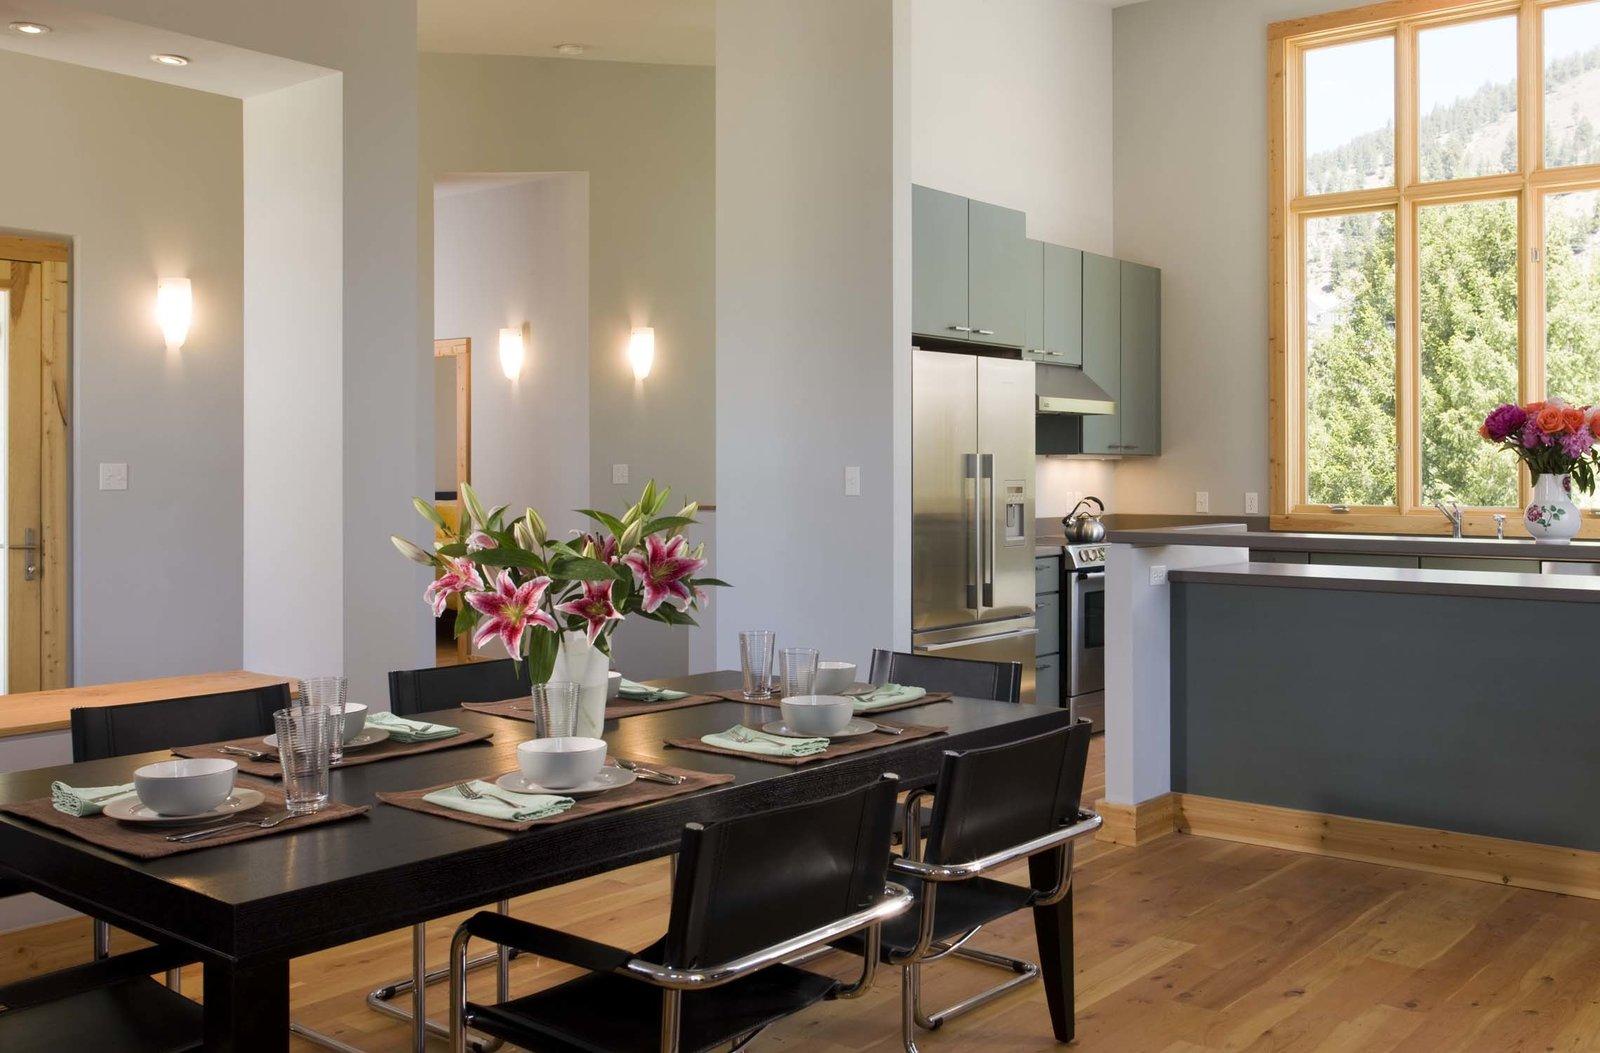 Dining Room, Bar, Table, Wall Lighting, Chair, and Light Hardwood Floor  Cliff House